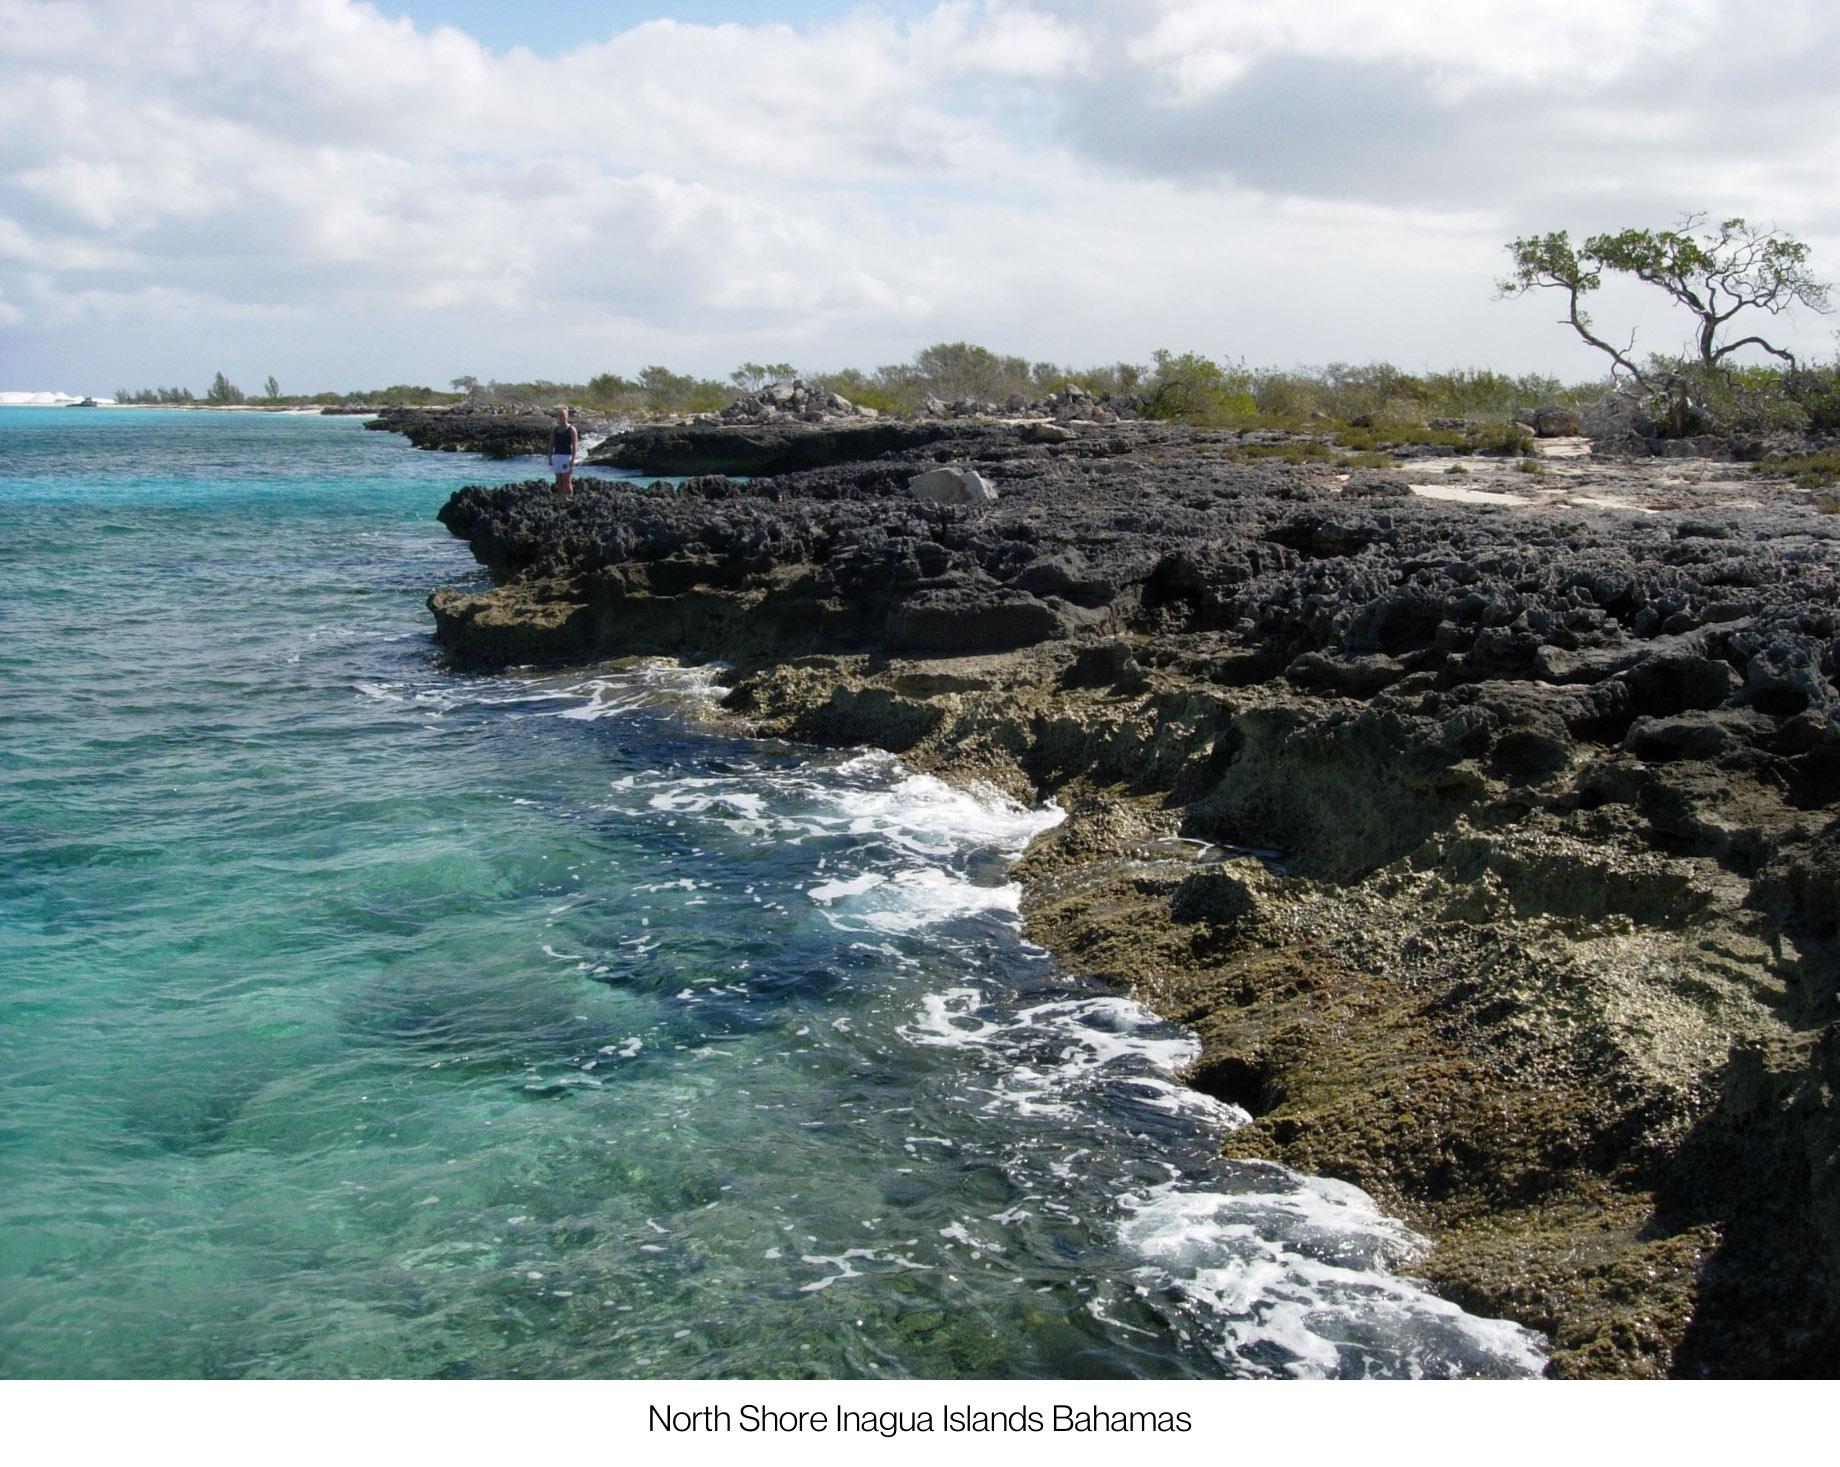 Discover The Hidden Island Gems of The Bahamas - North Shore Inagua Islands Bahamas